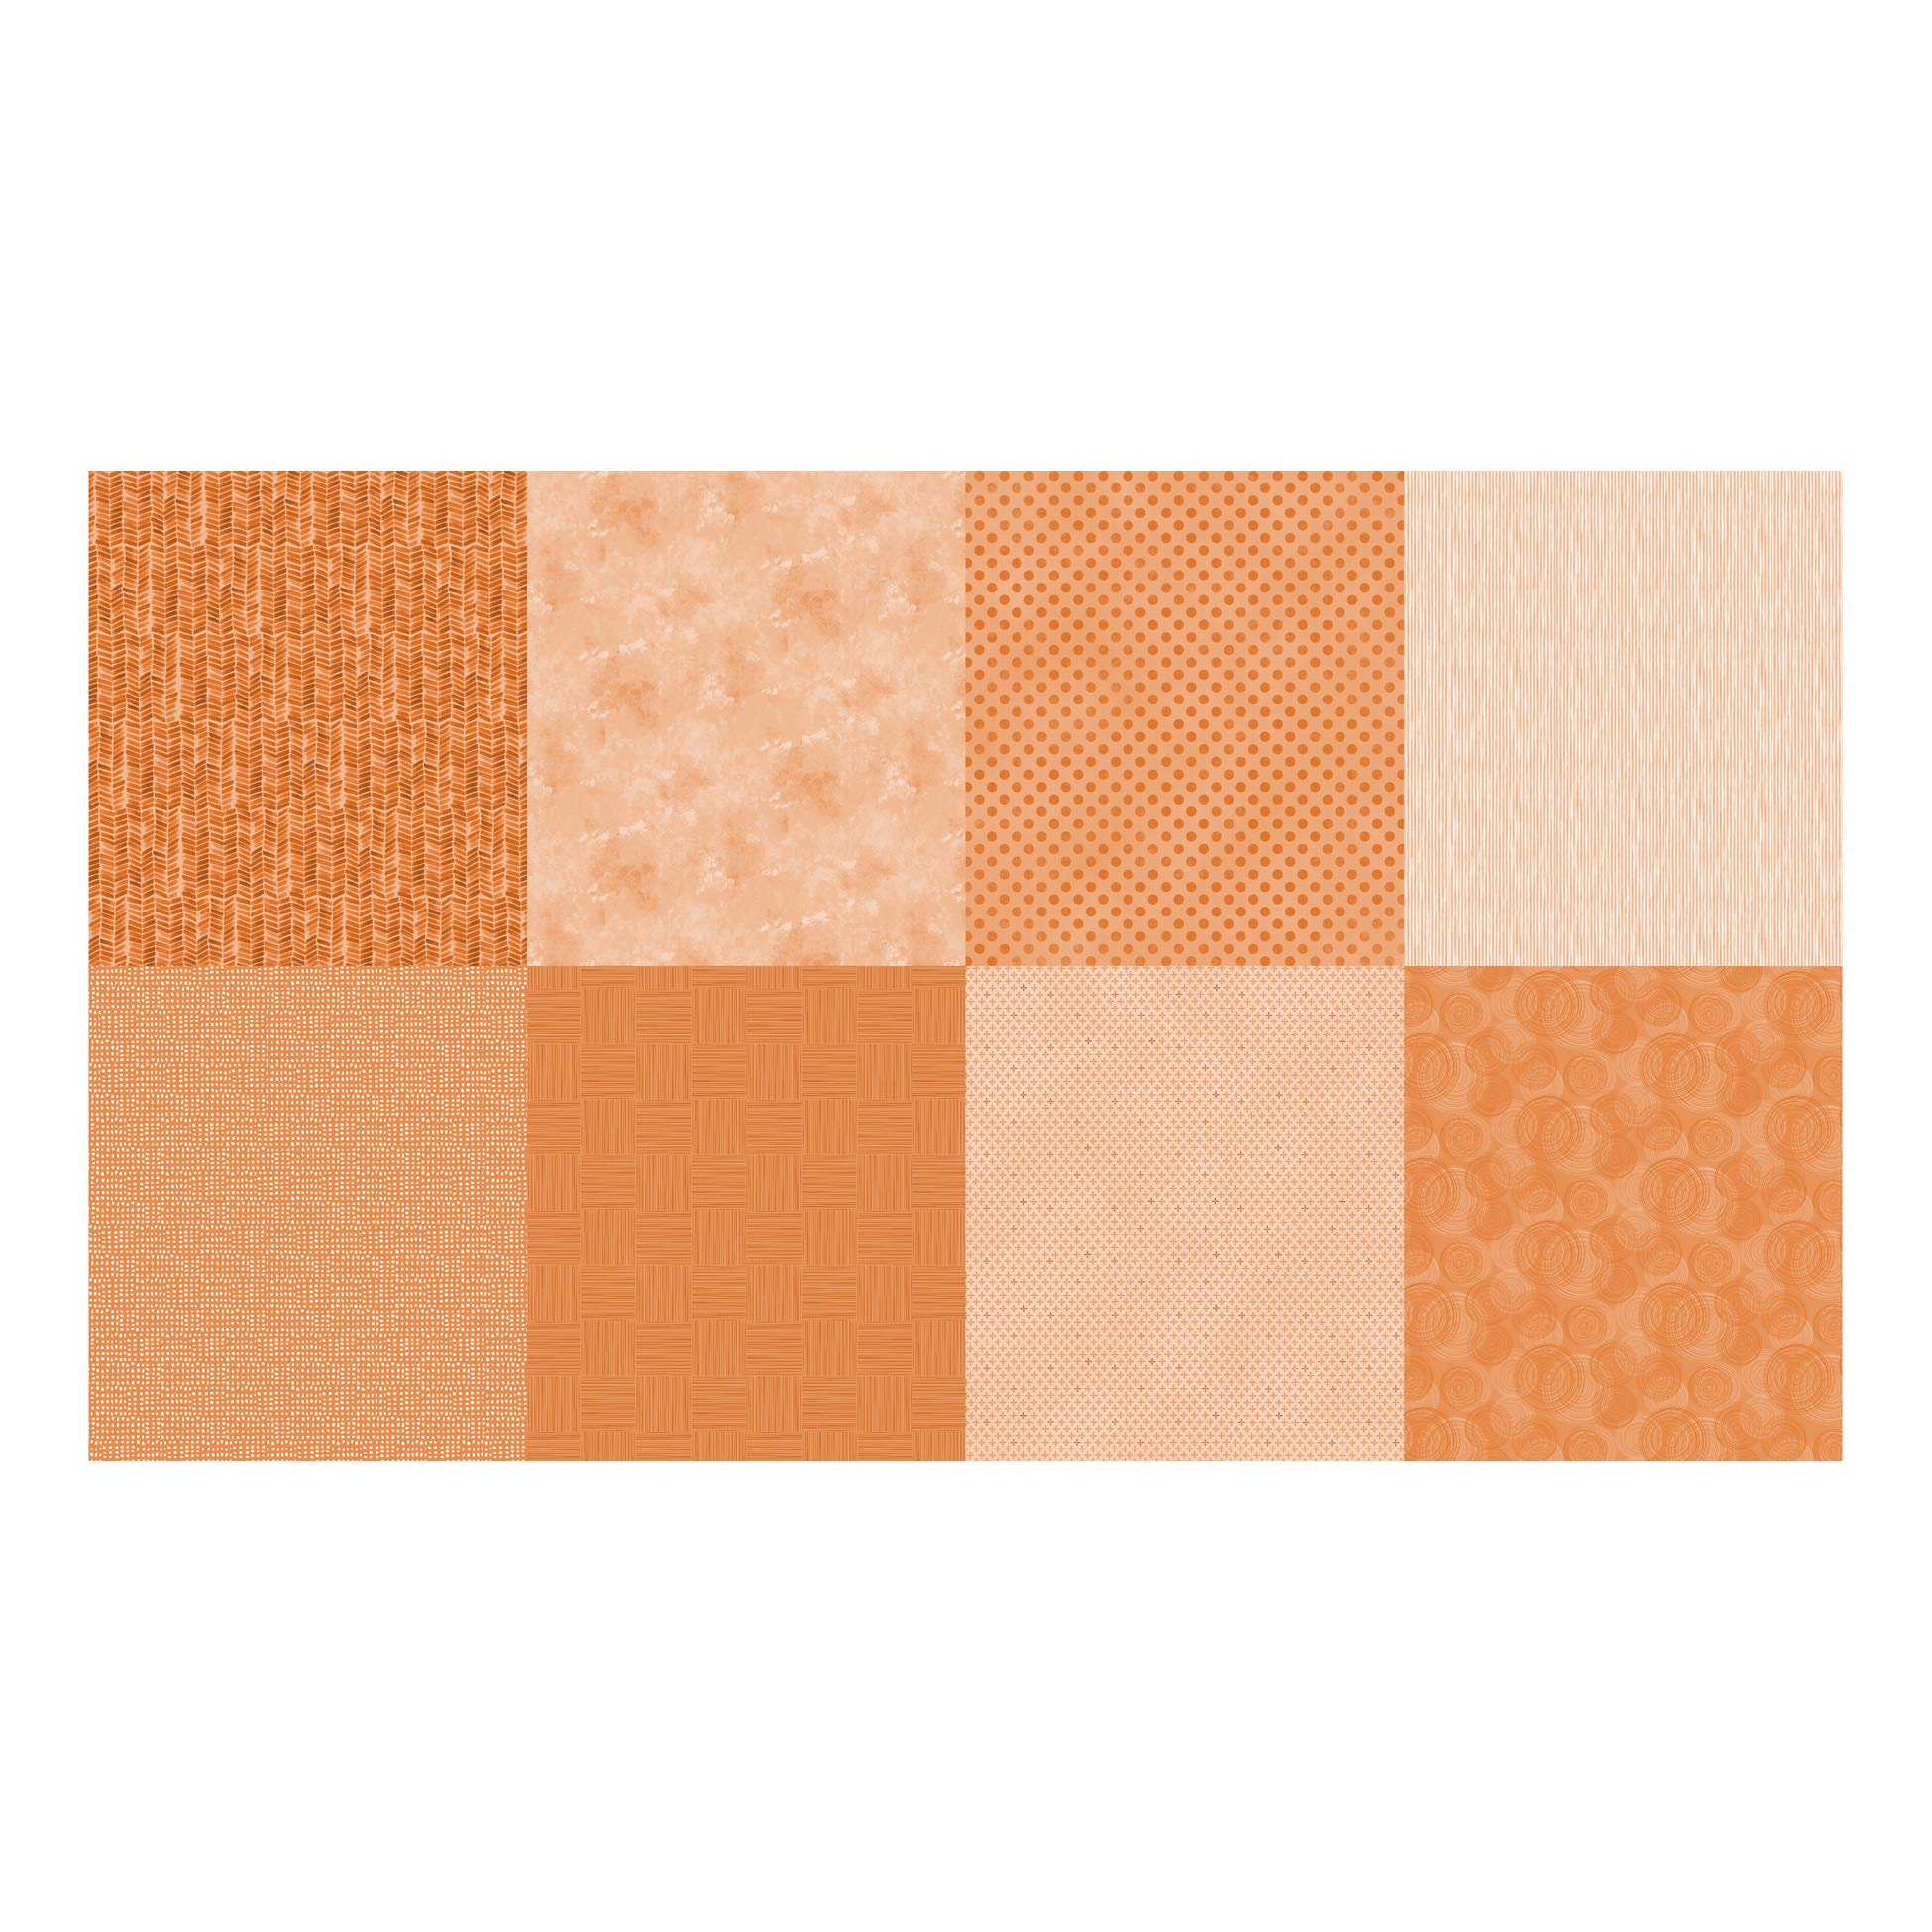 Hoffman Fabrics Digital Details Blender 90'' Panel Fabric, Tangerine